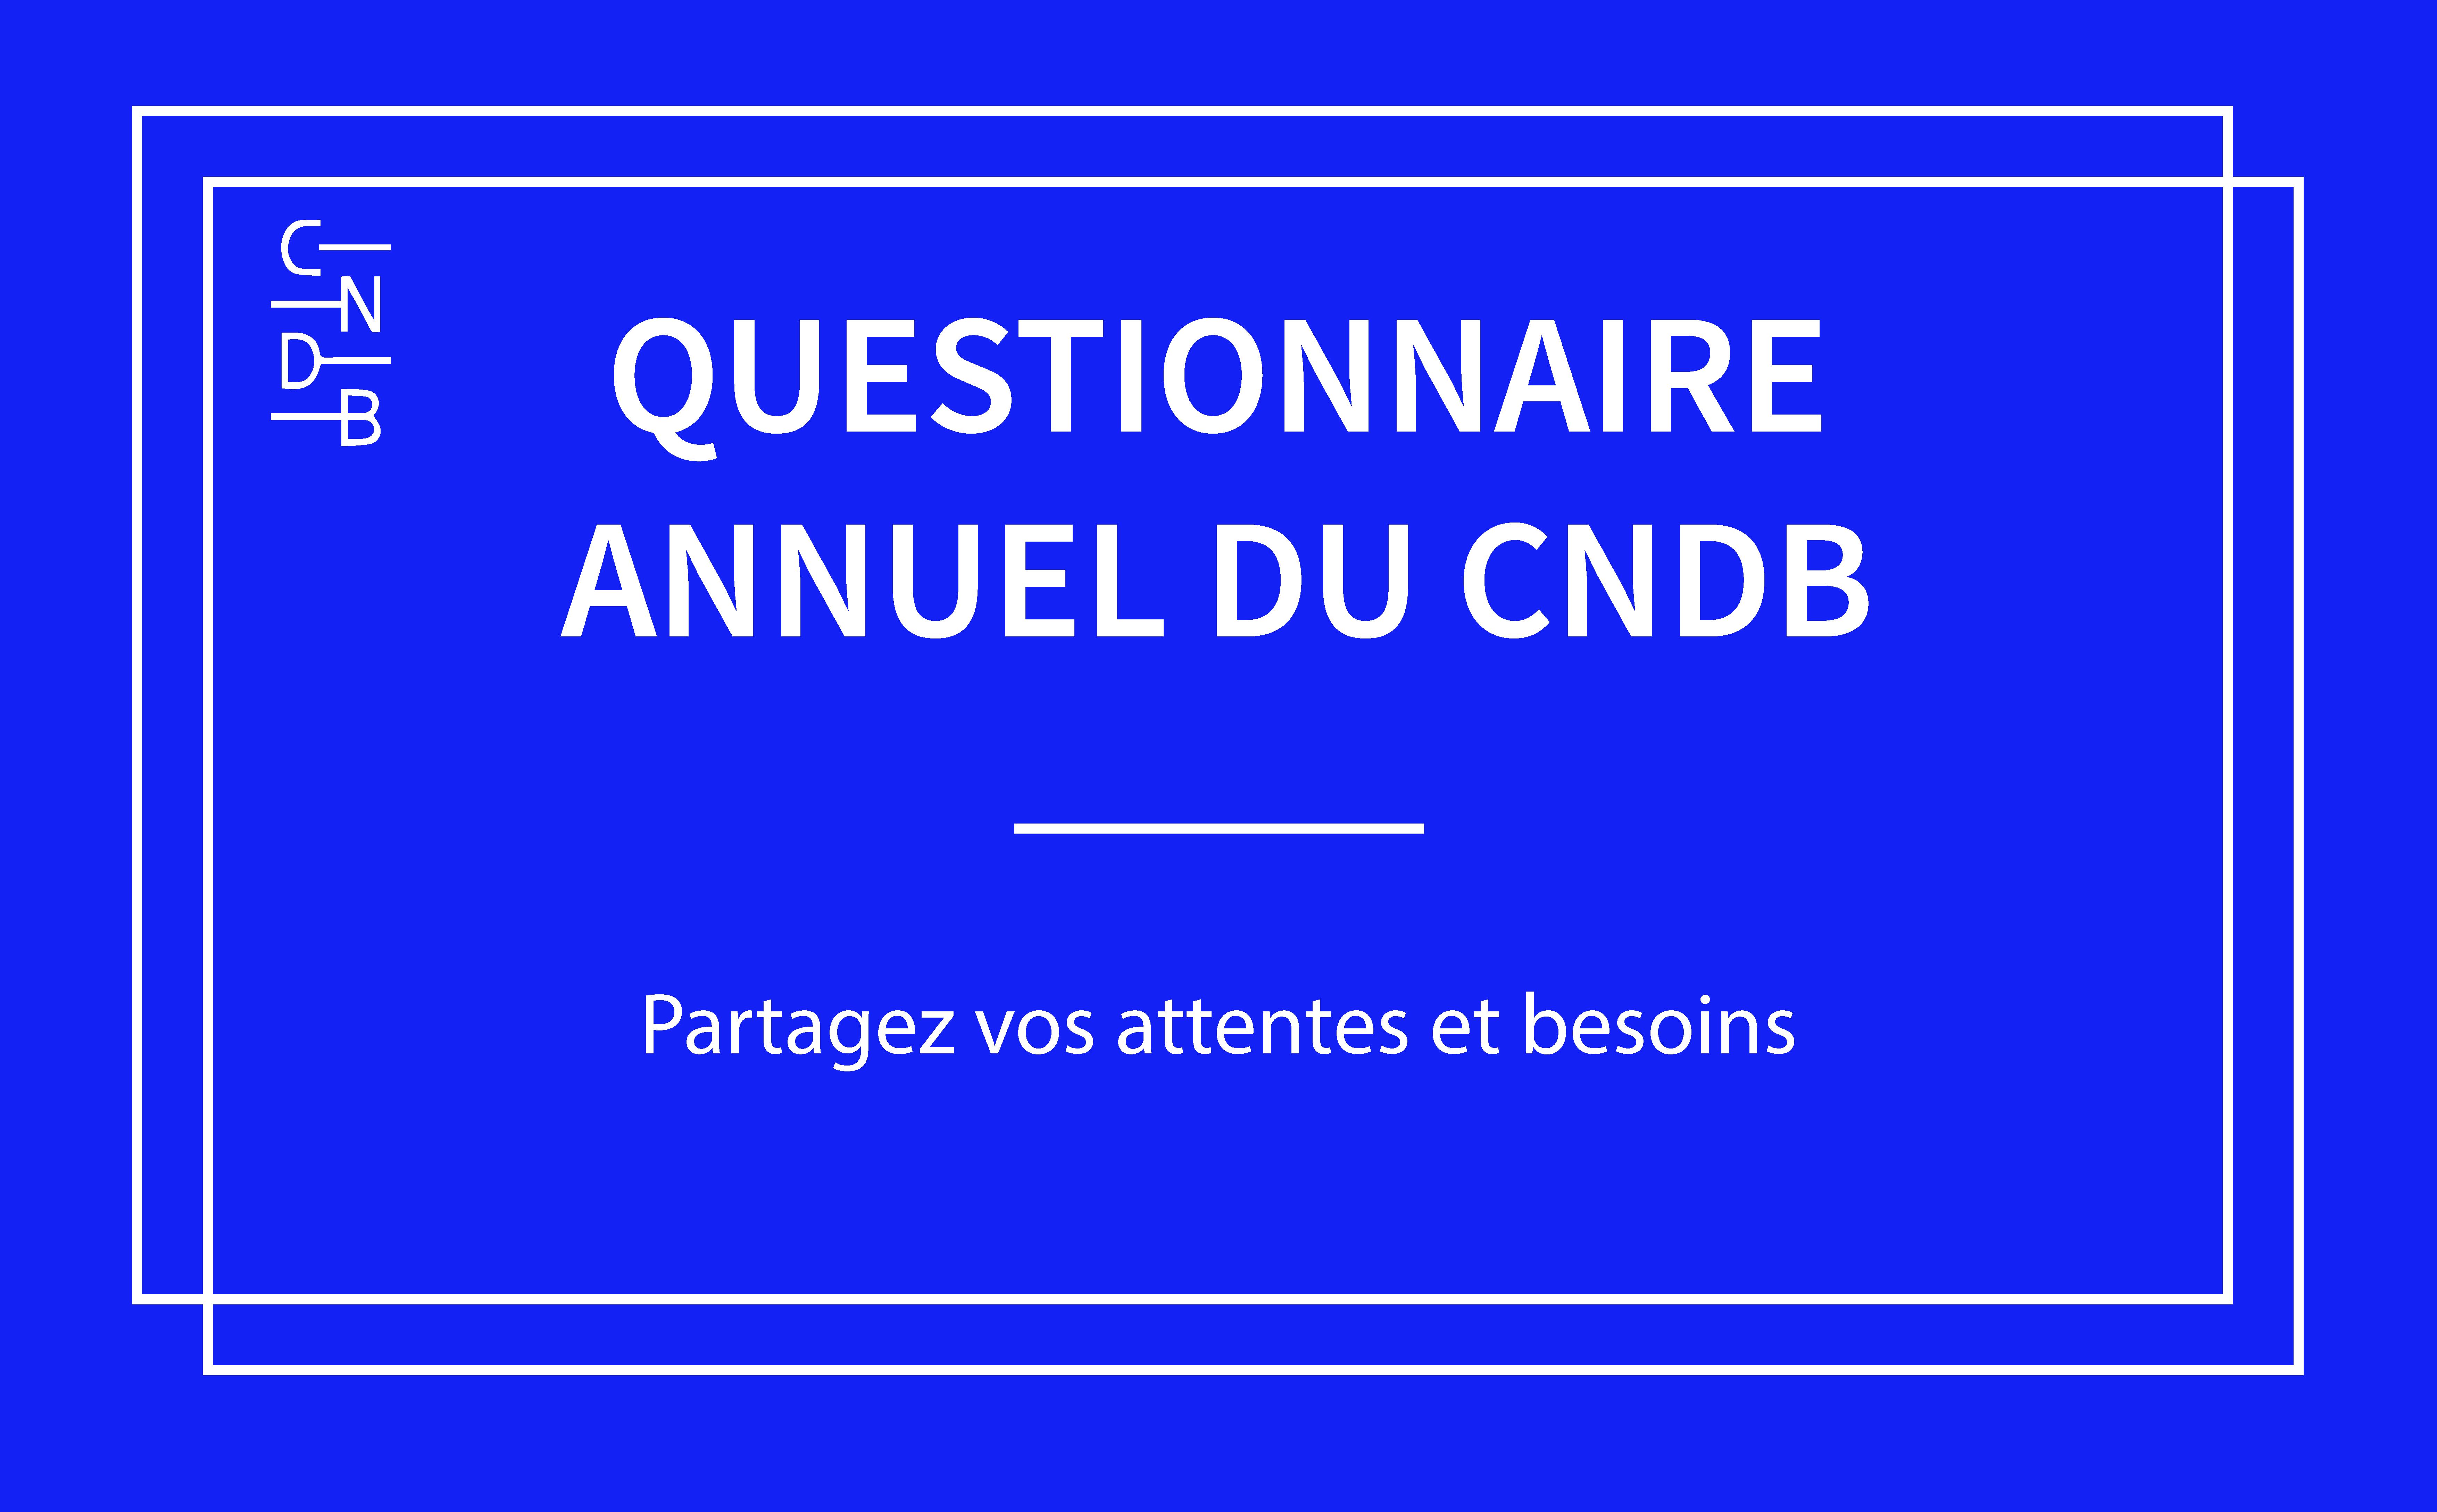 Questionnaire annuel du cndb-14